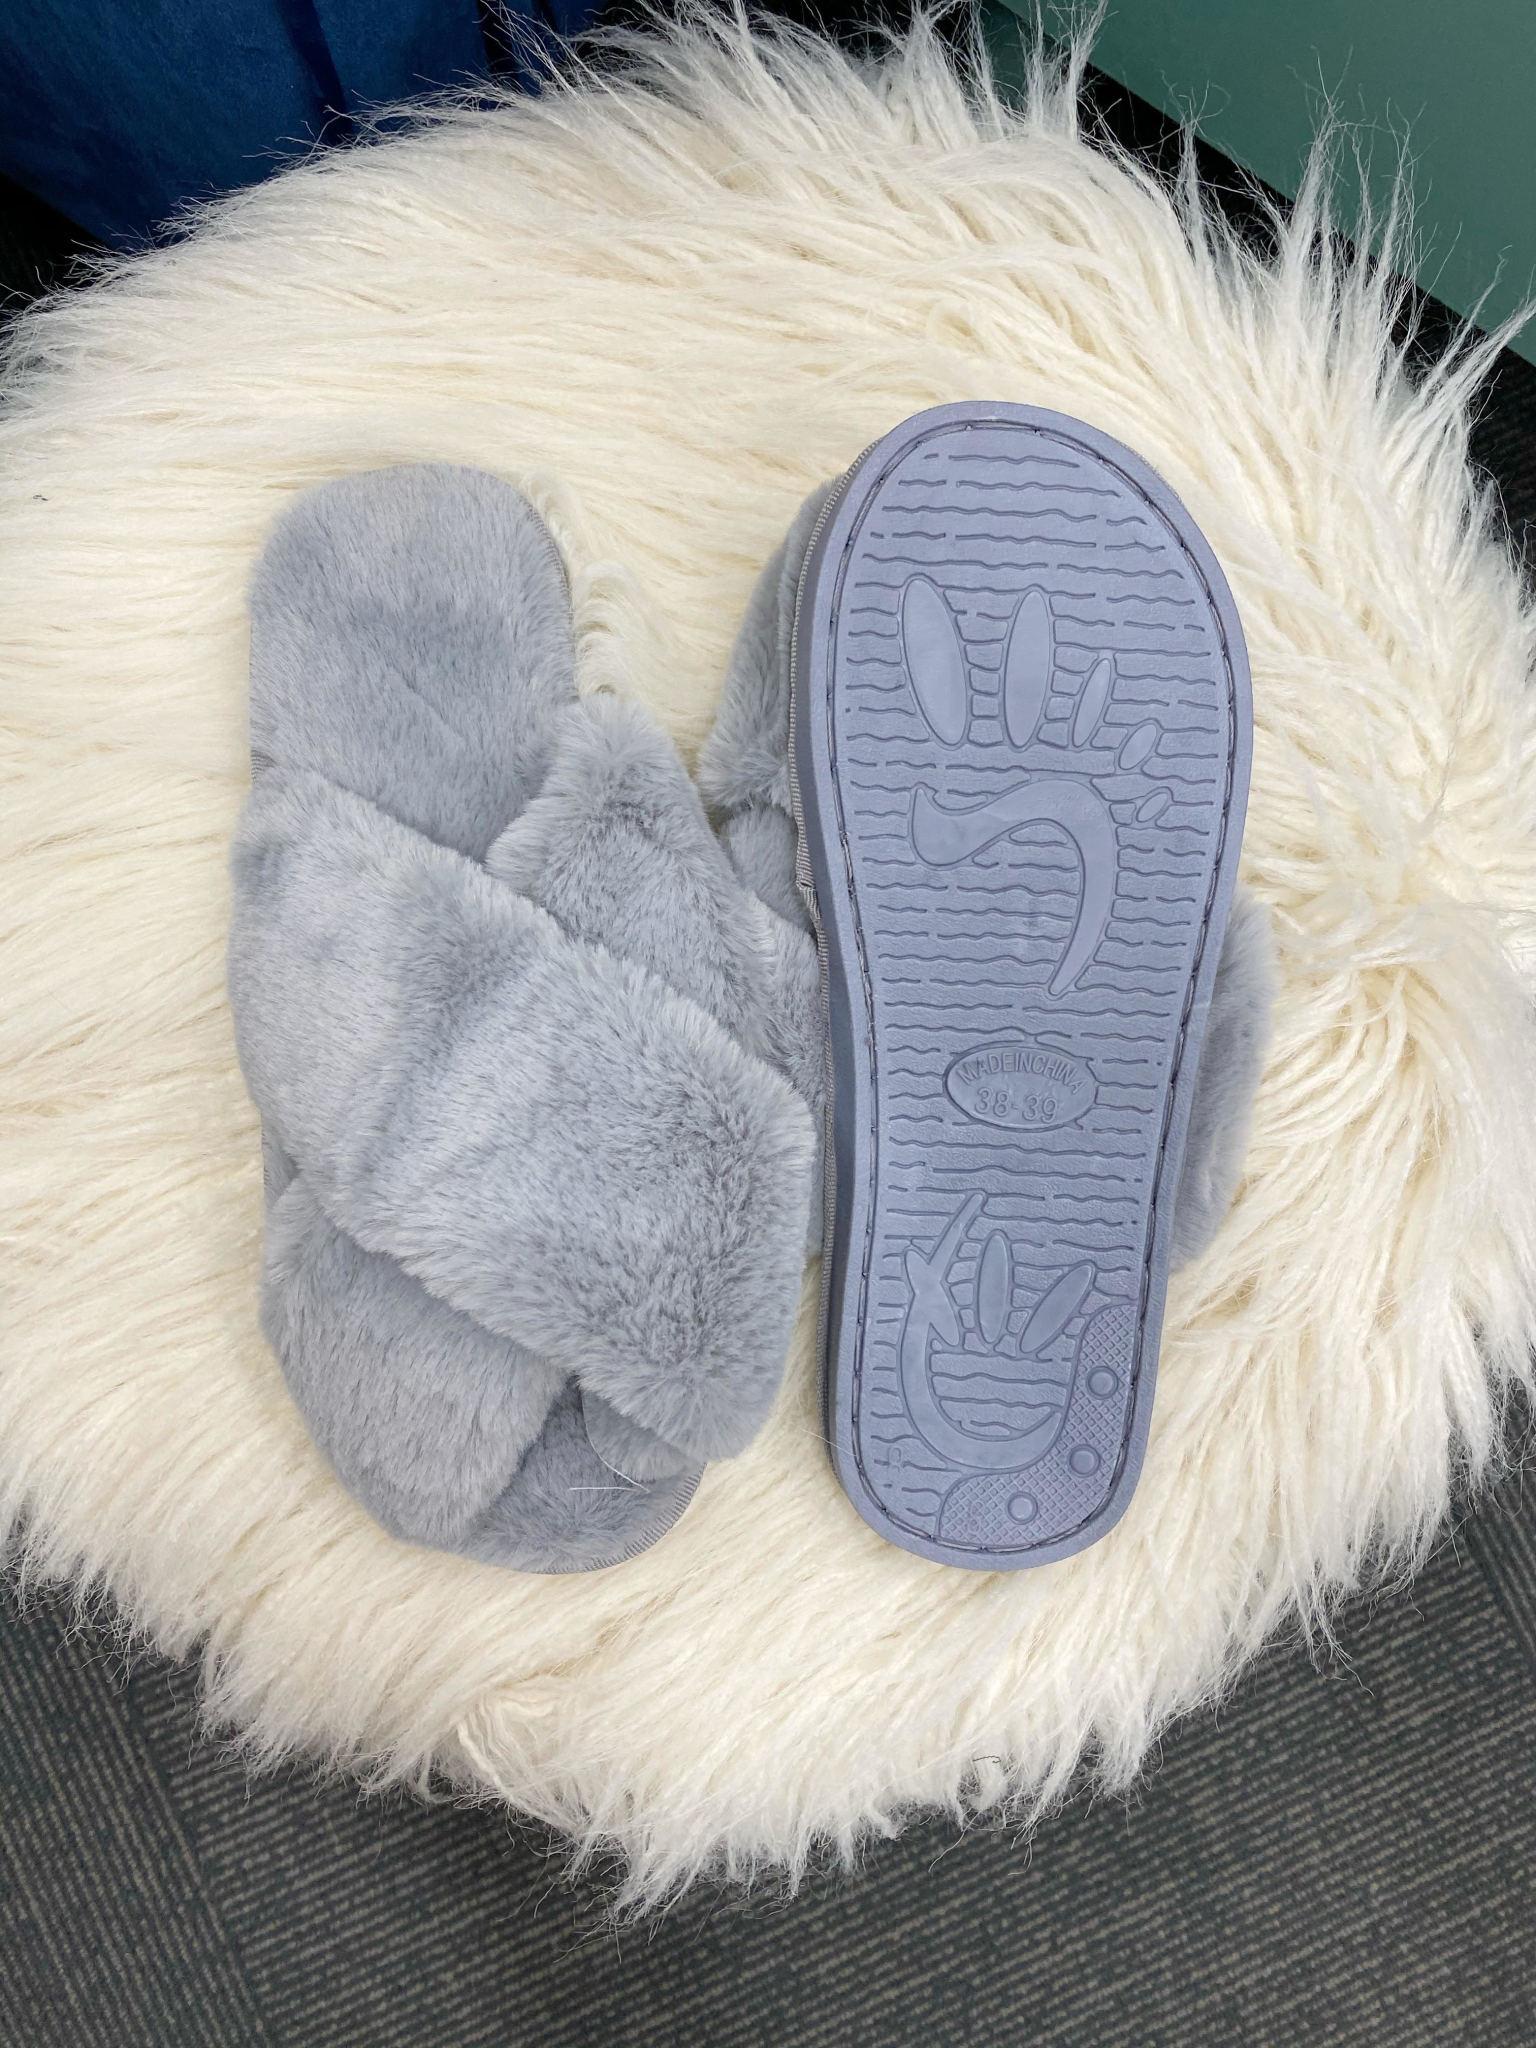 Cora Gray Fuzzy Slippers